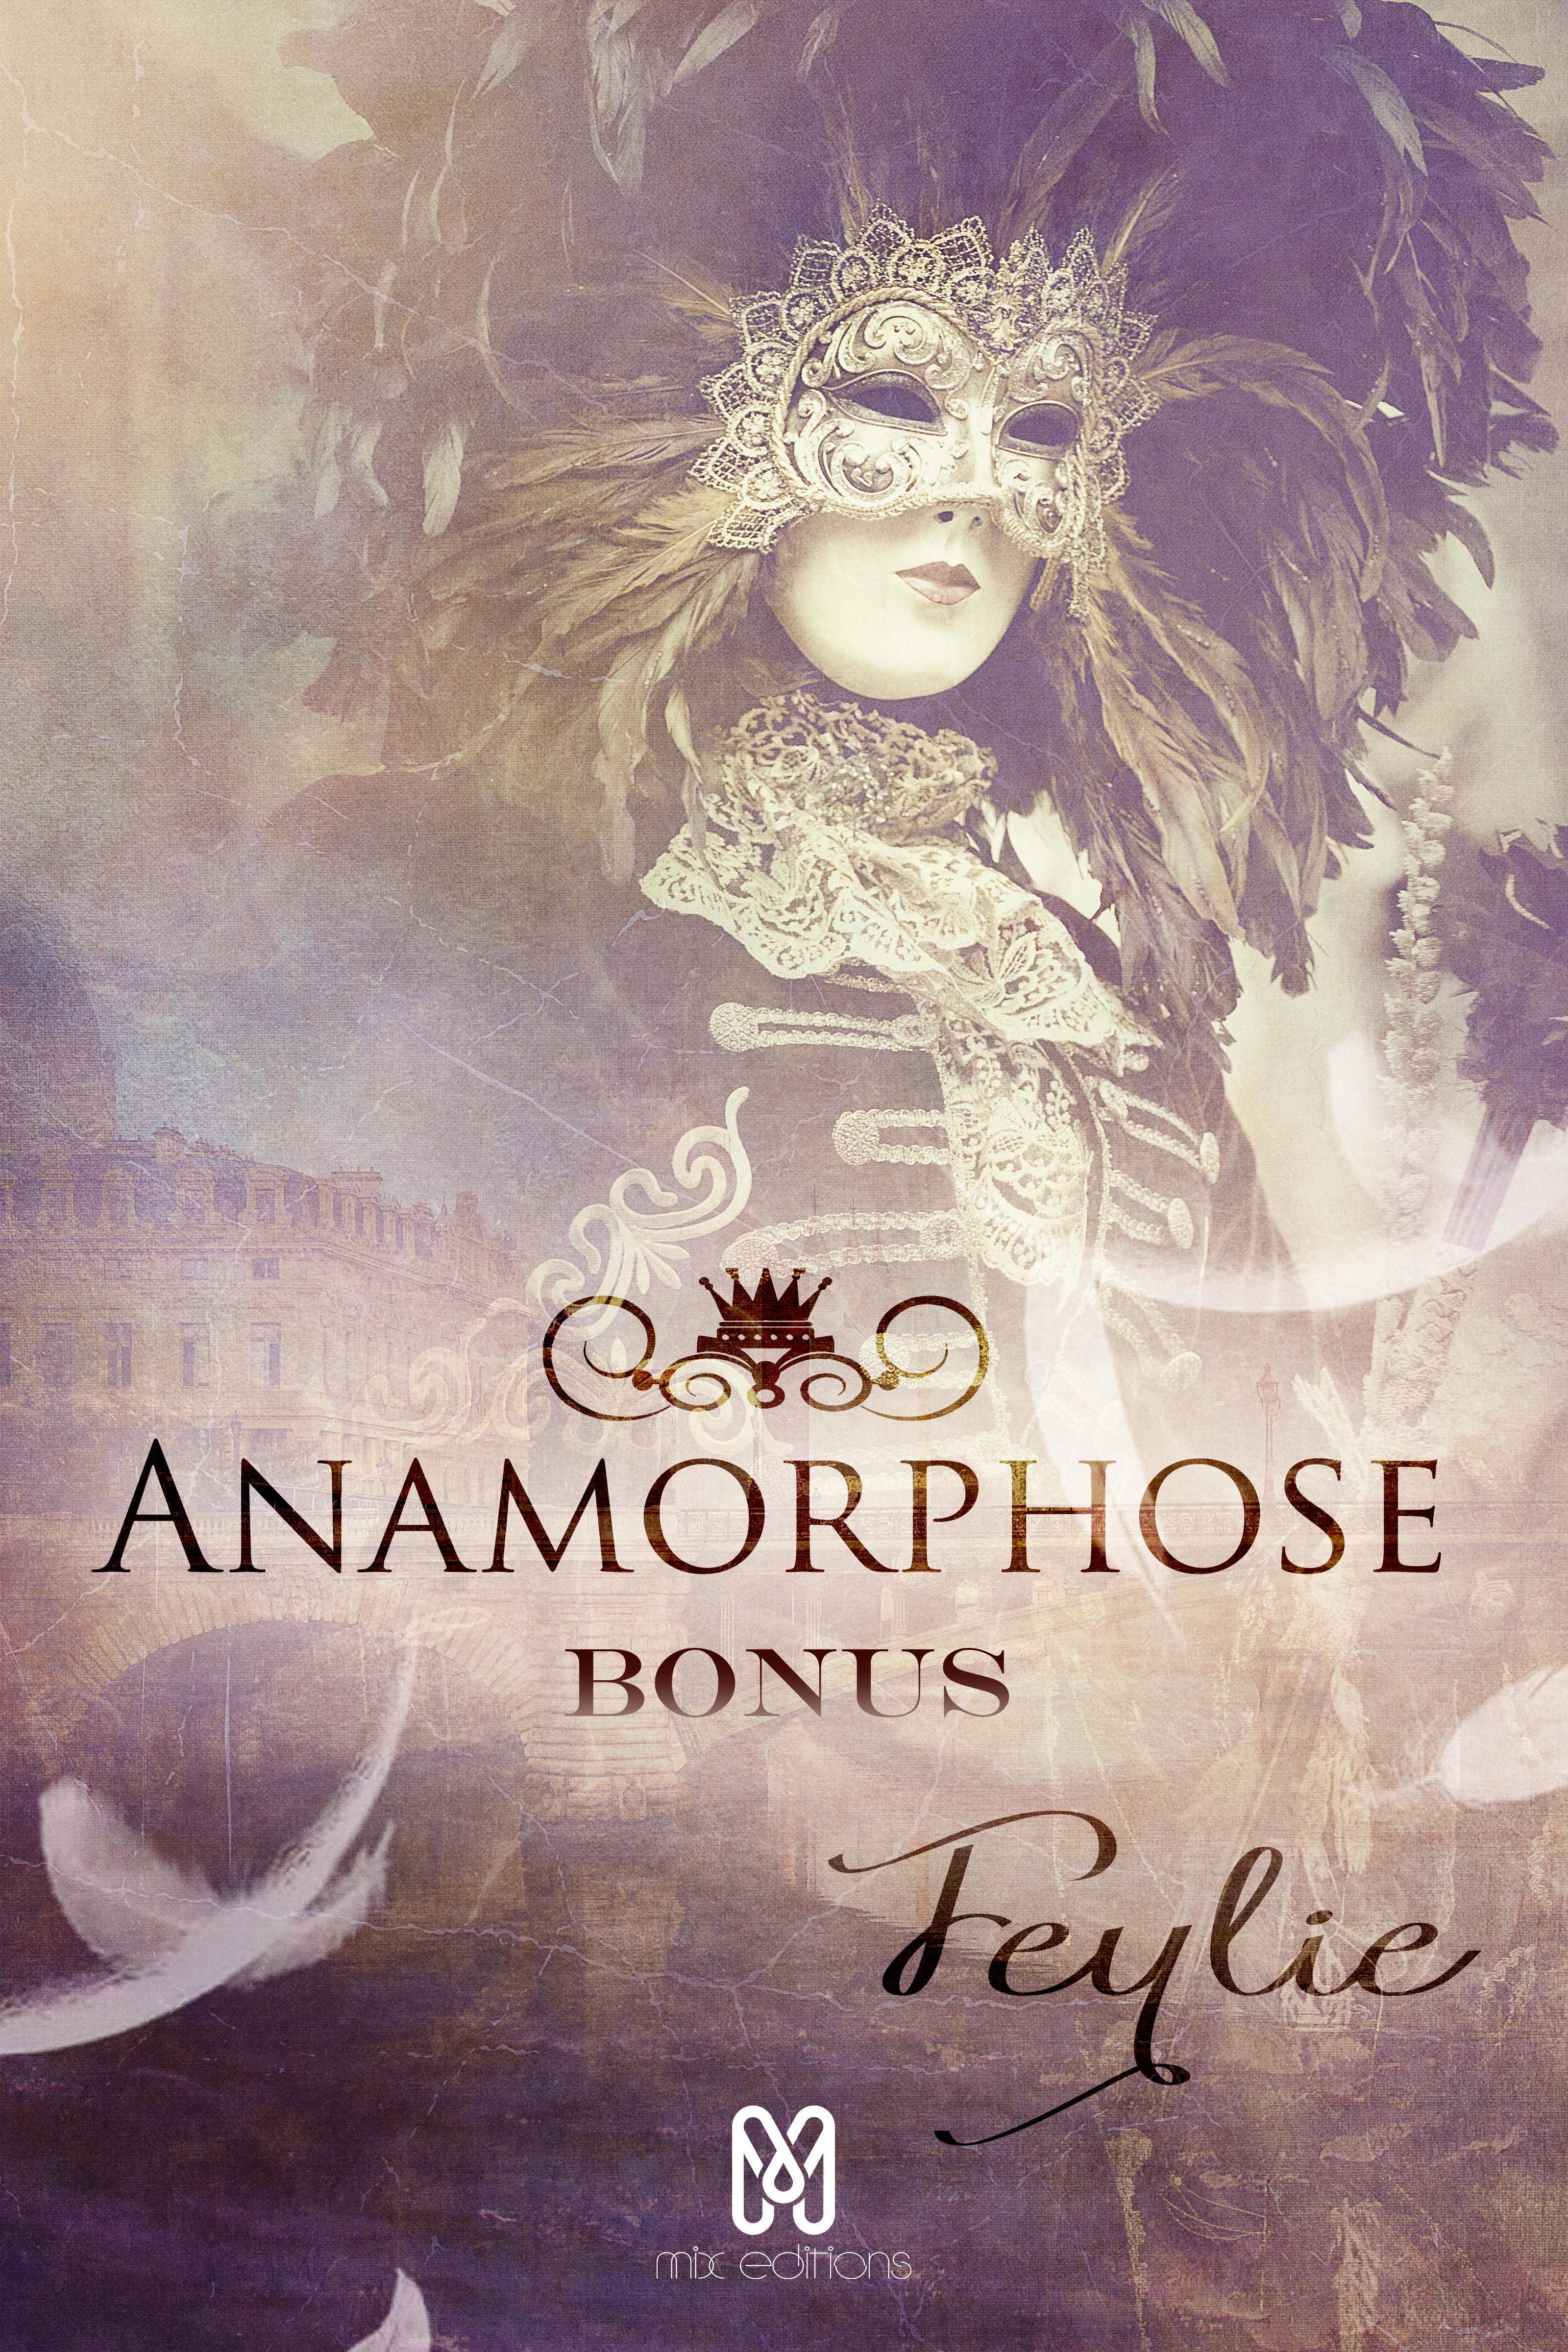 Anamorphose : Nouvelle Bonus